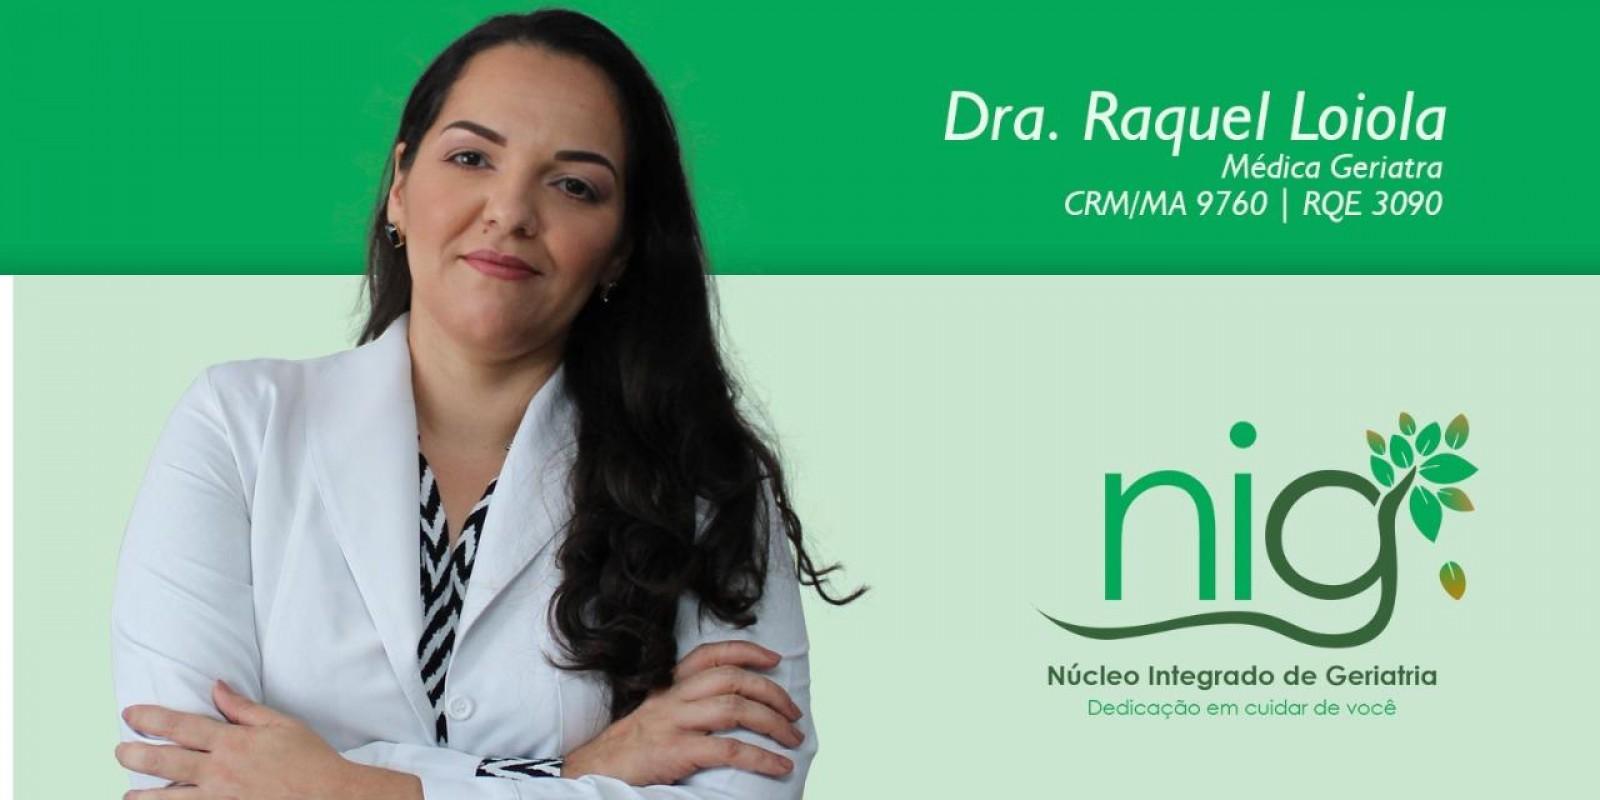 Raquel Loiola